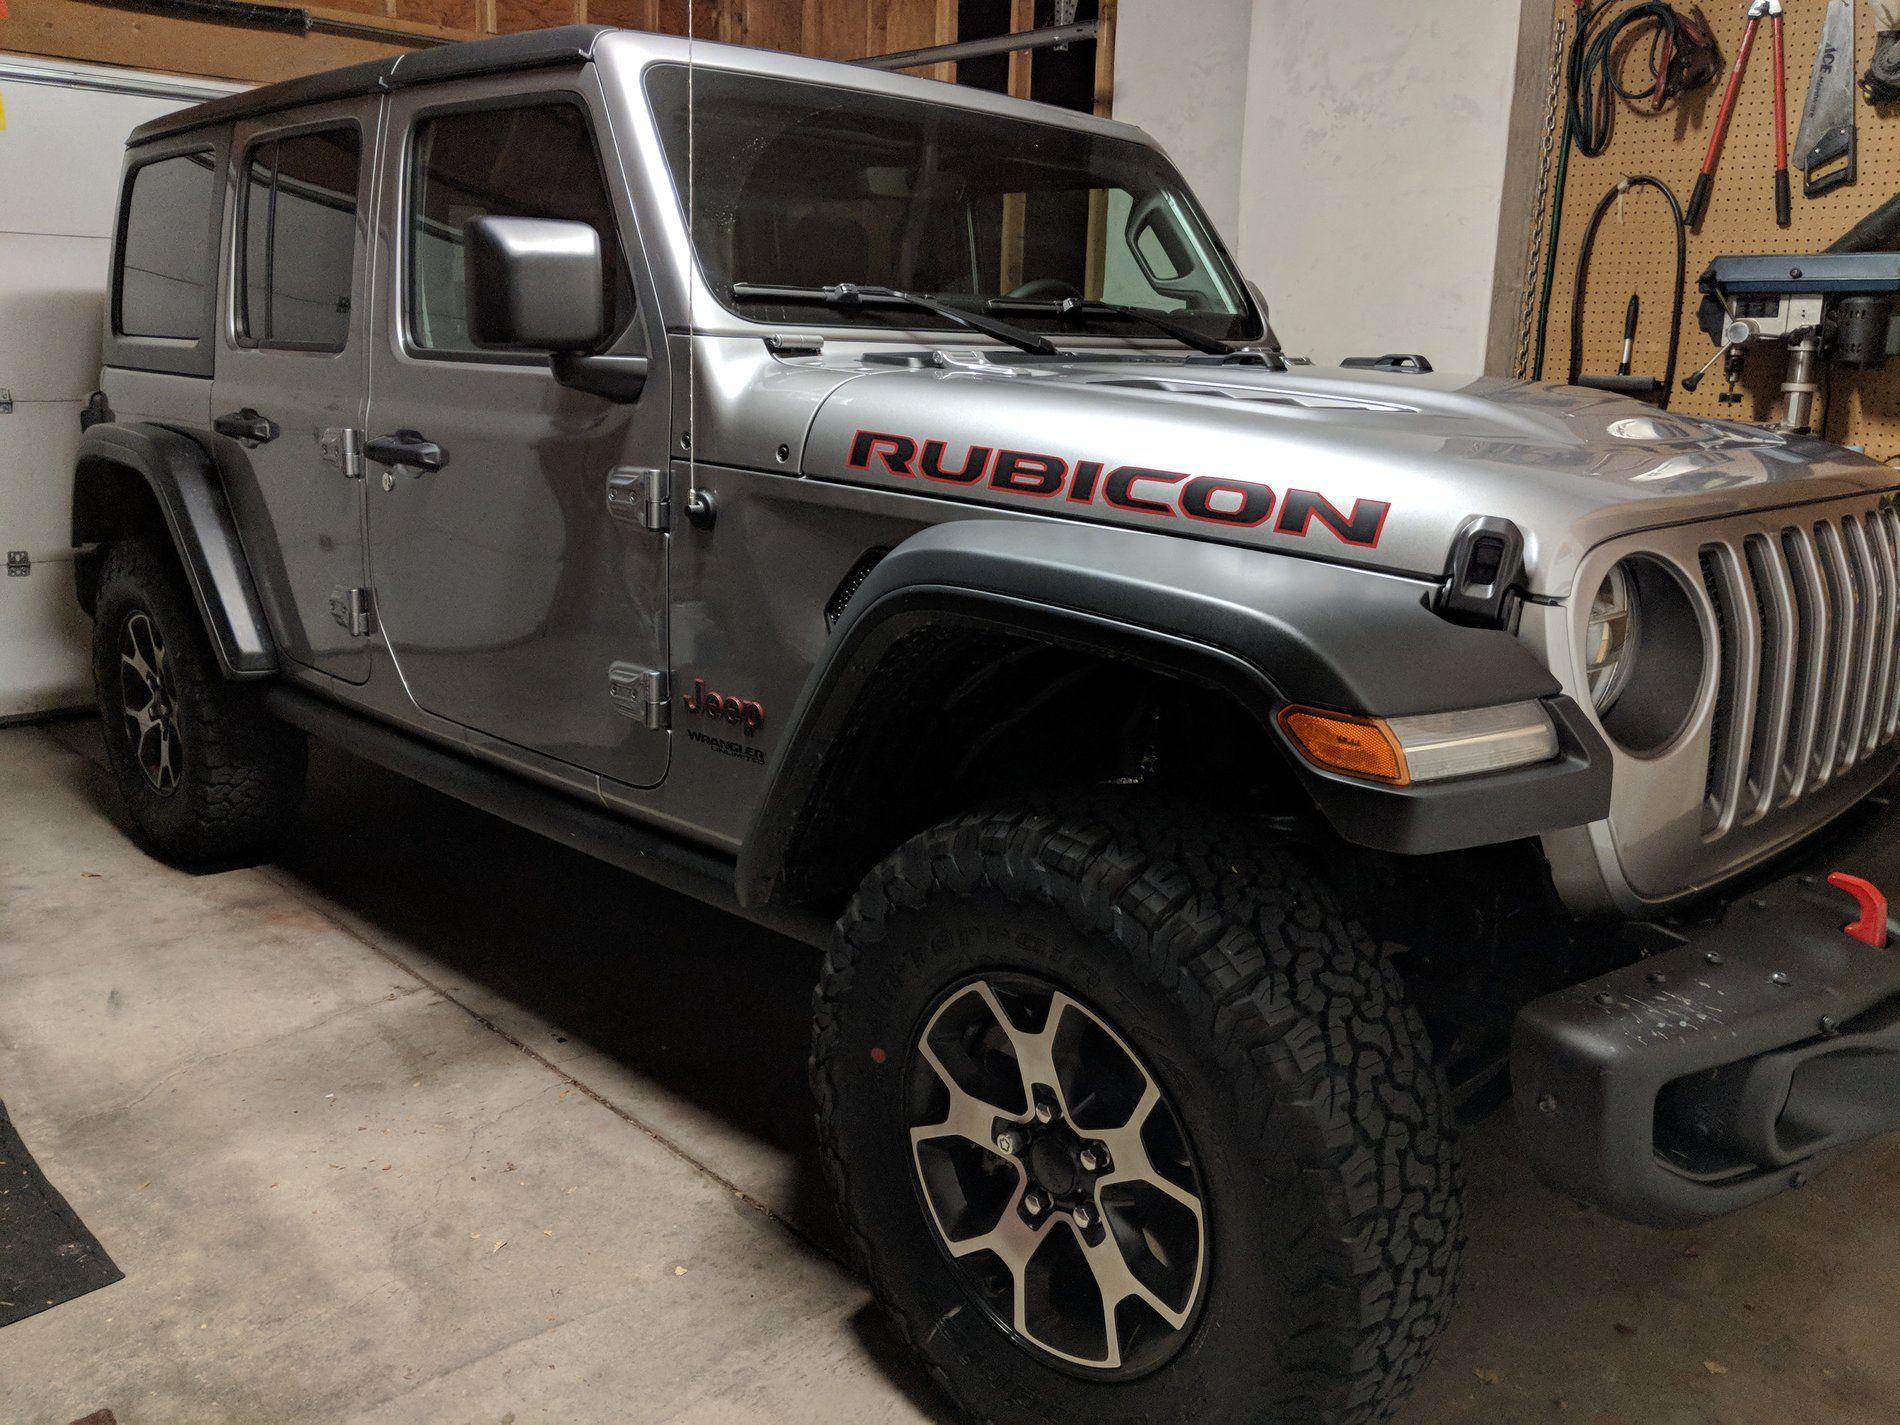 Jeep Jl Jeep Rubicon Jeep Wrangler Jl Sting Gray Jeep Warn